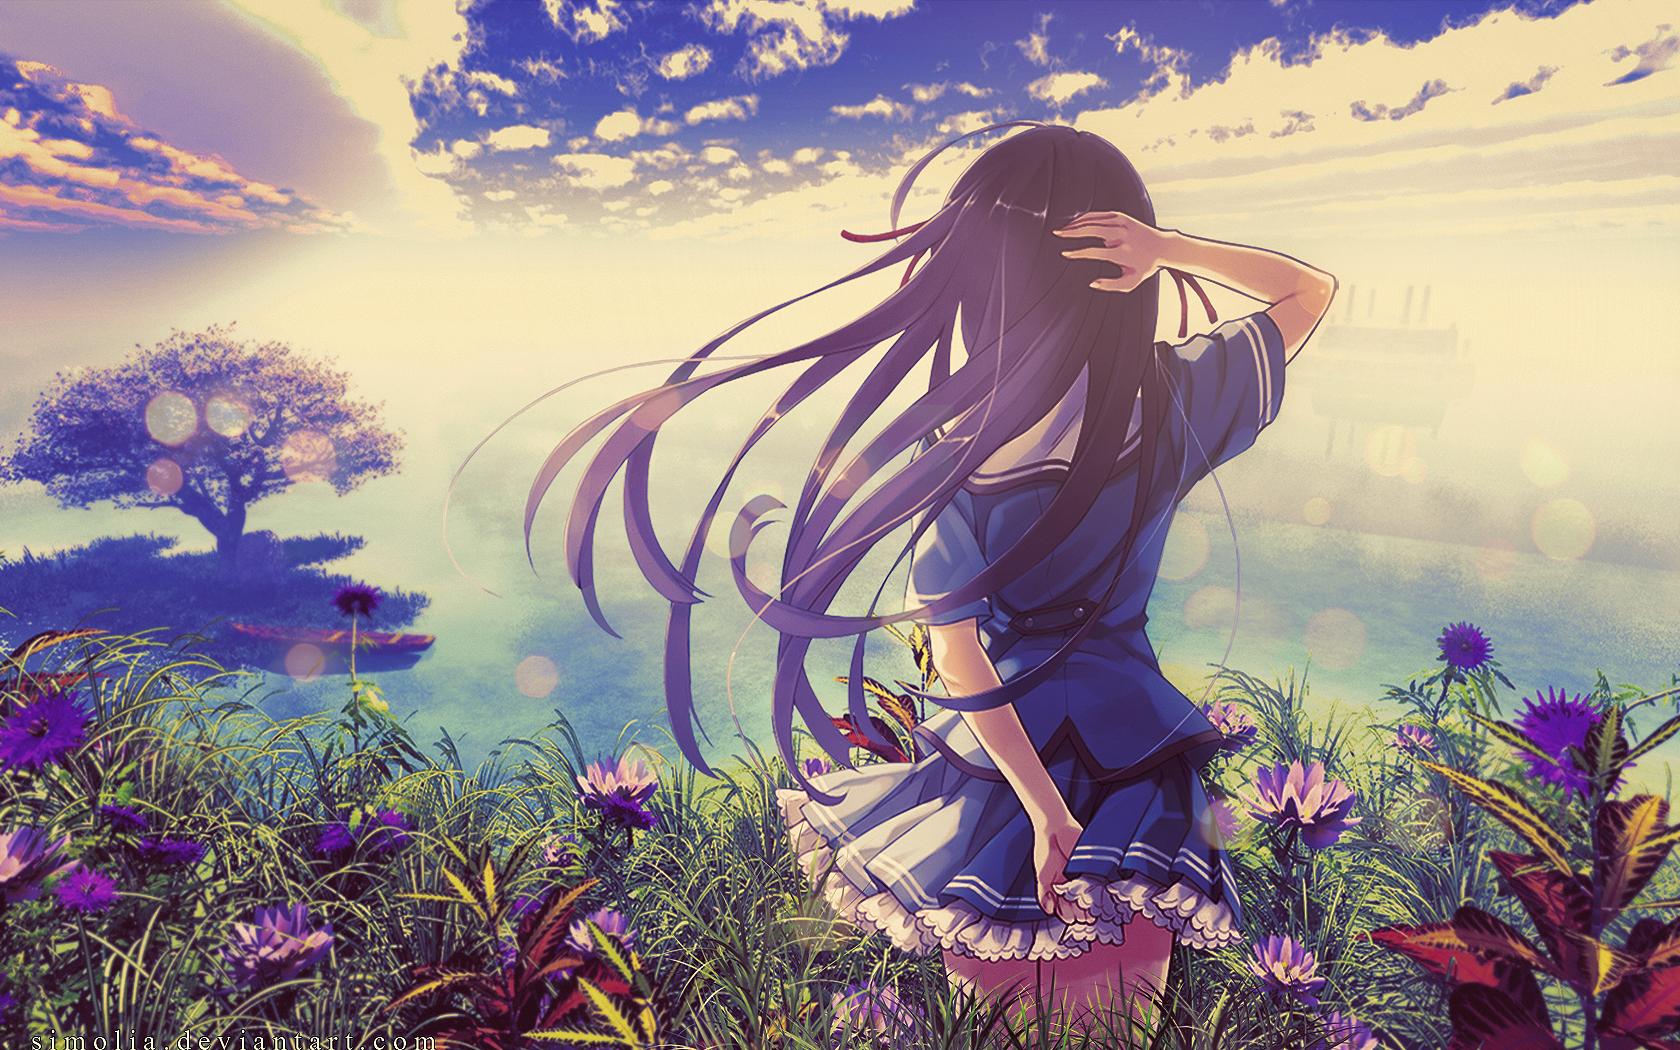 Anime wallpaper tumblr wallpapersafari - Anime pretty girl wallpaper ...